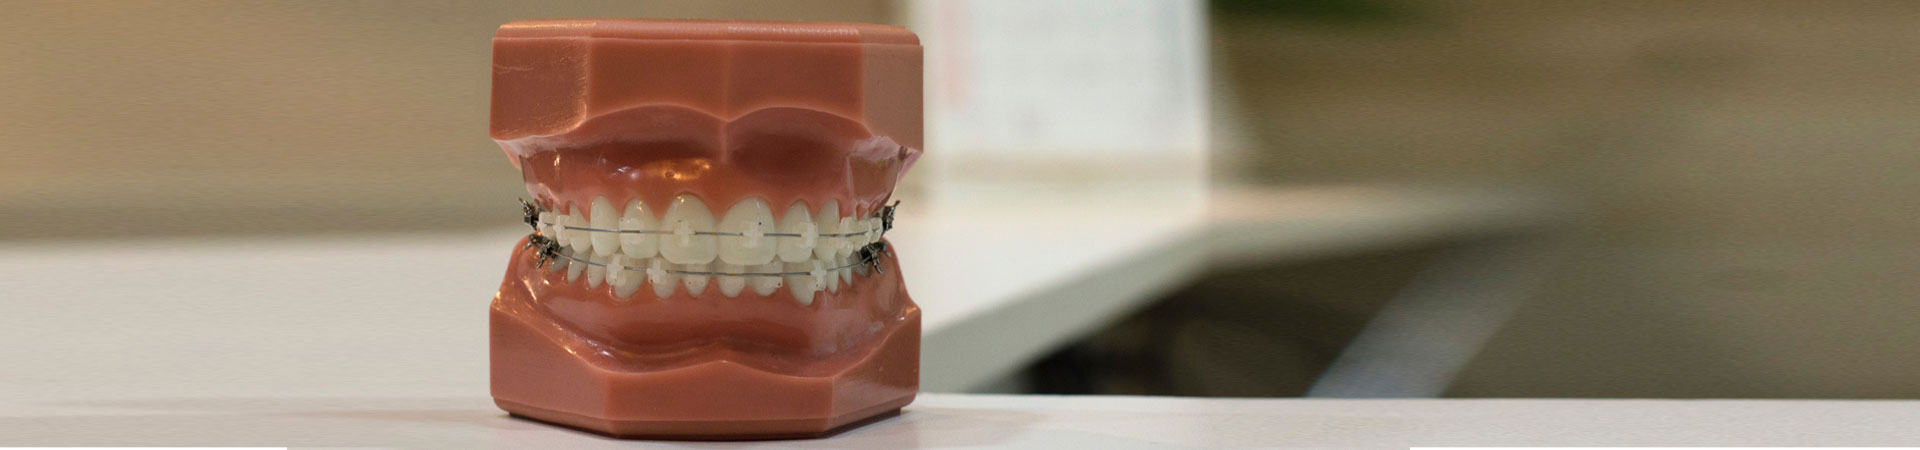 Cost of dental implants in India, Dental Implant price, Dental